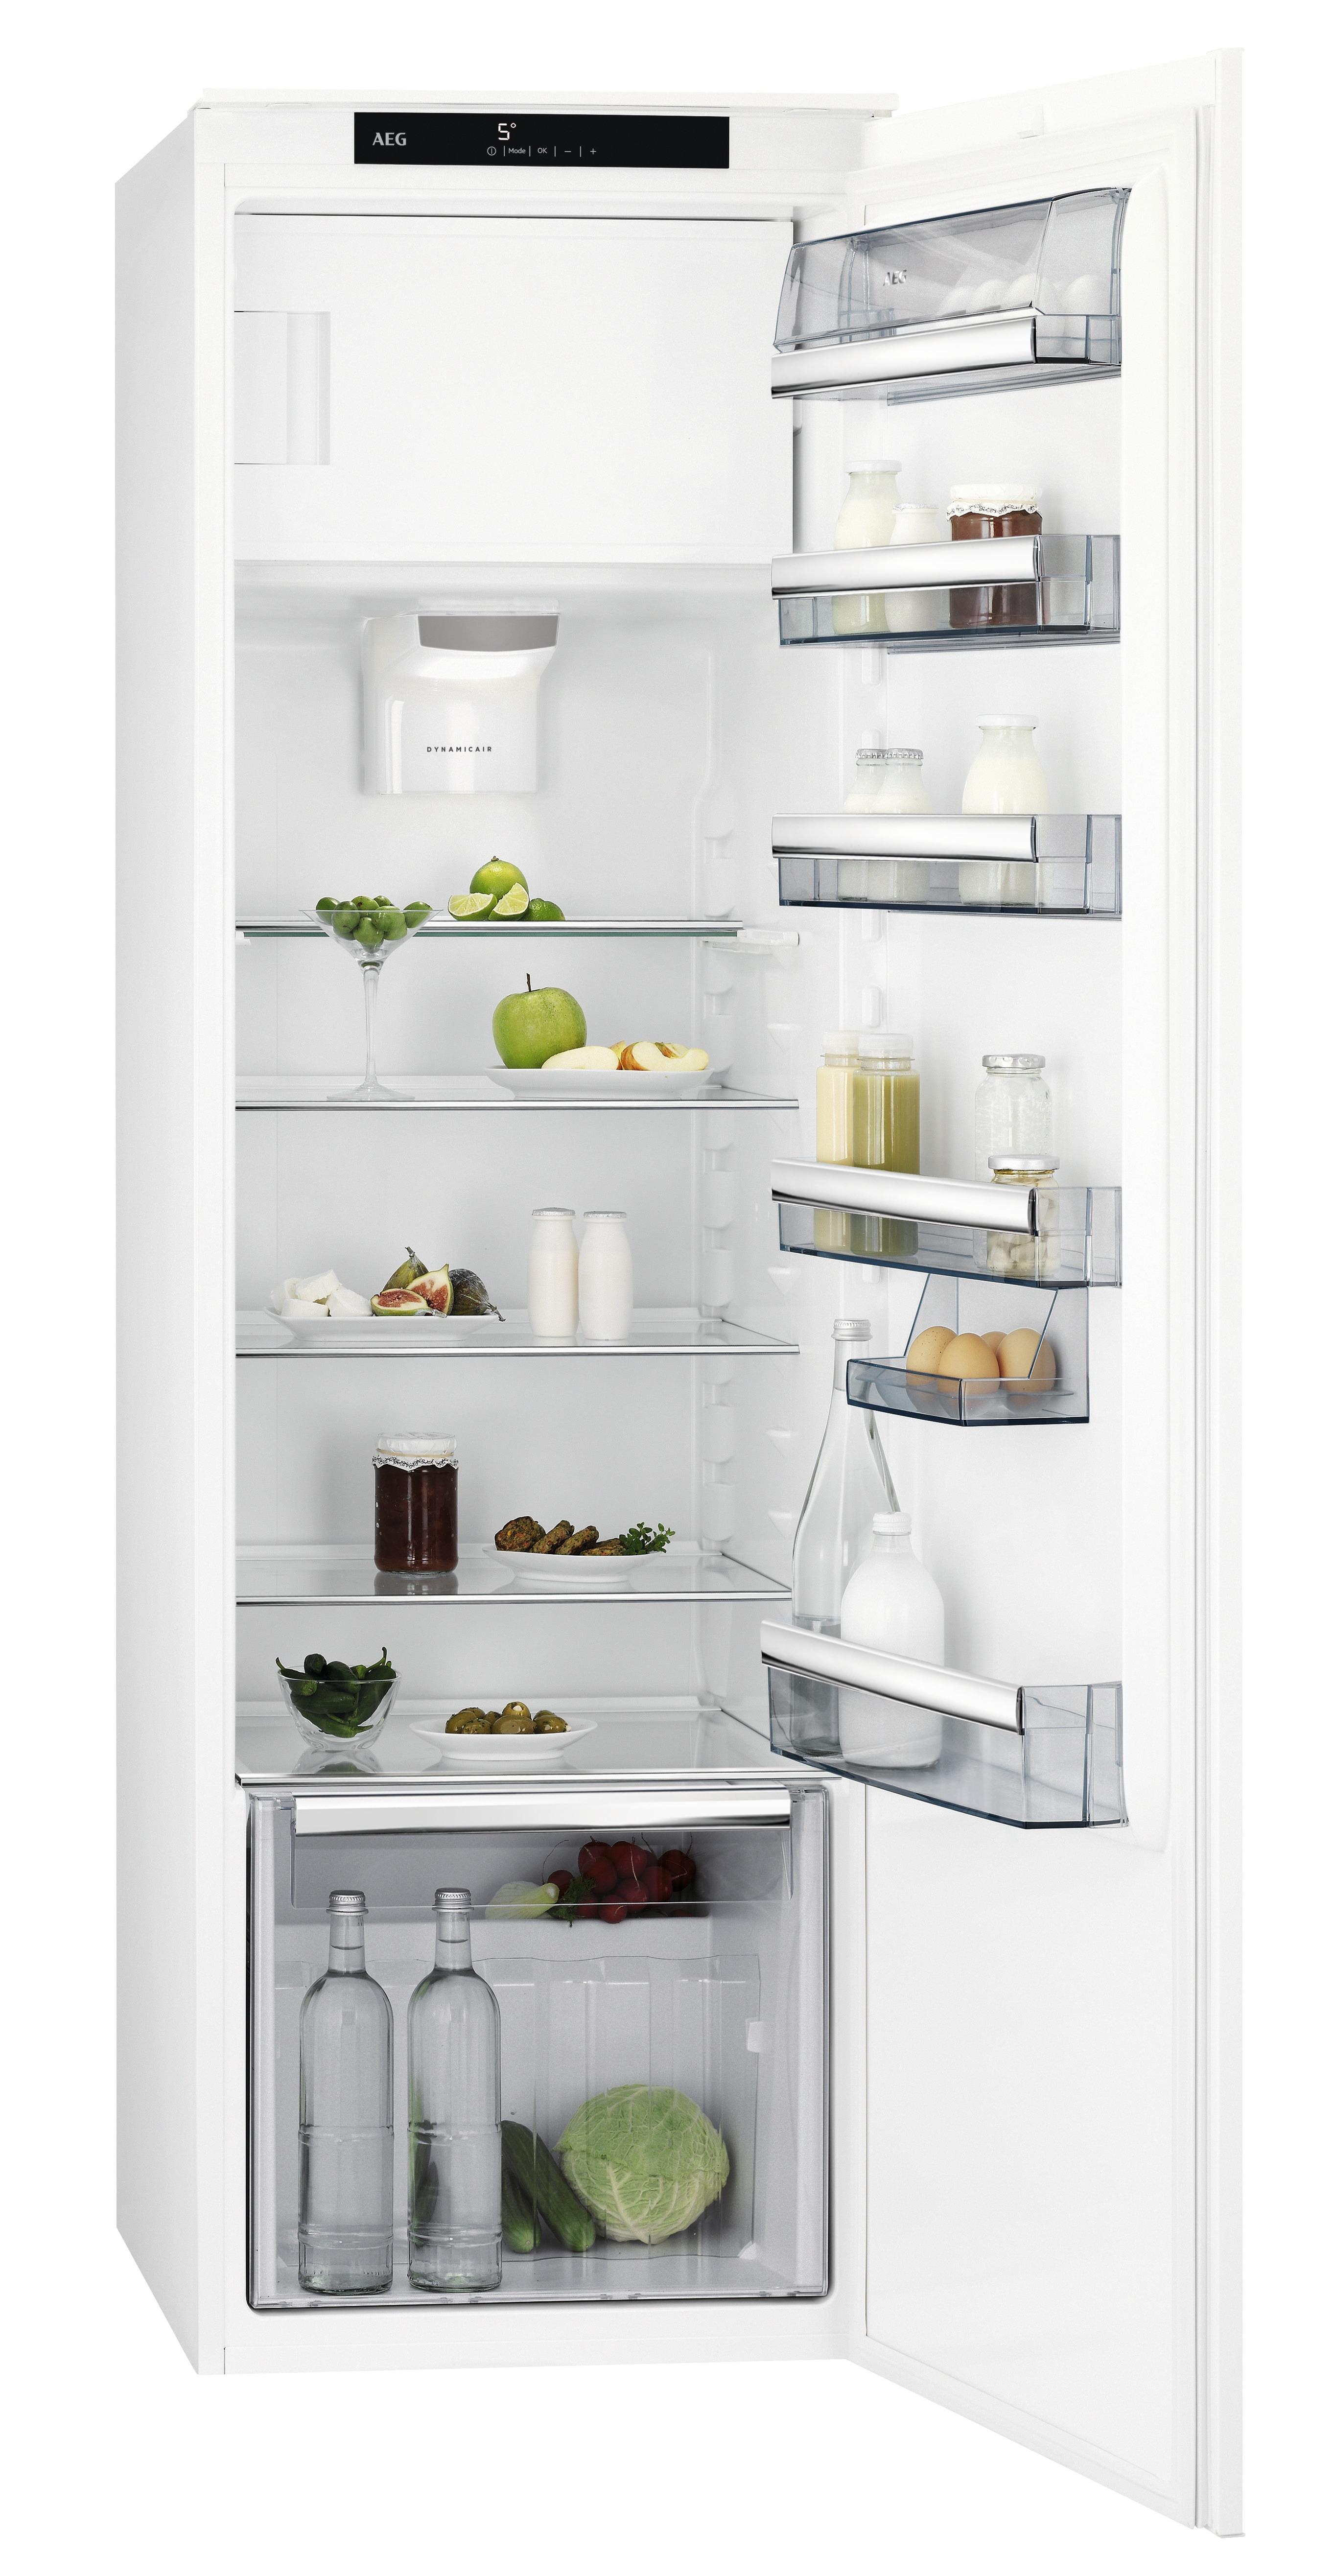 AEG SFE818F1DS Inbouw koelkast Wit